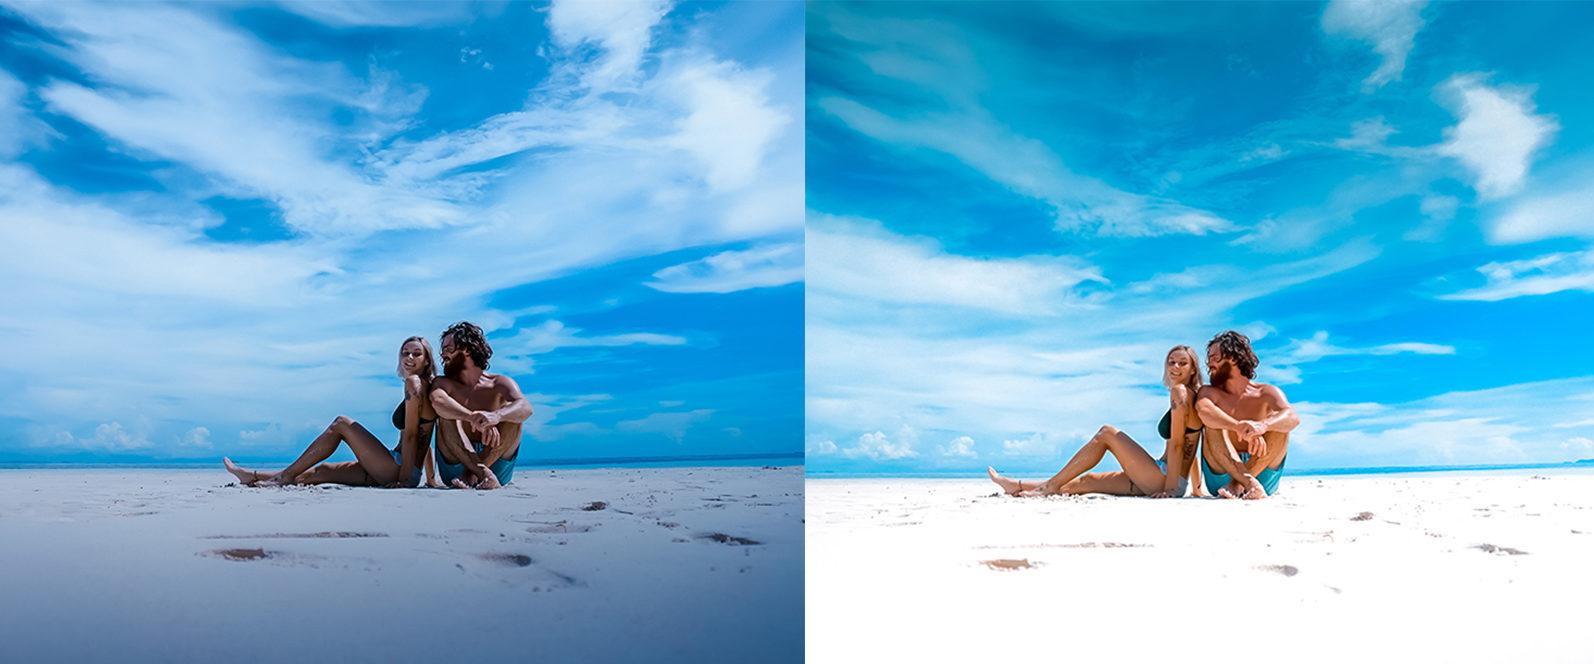 BUNDLE /// 04_Travel Collection // 64 x Desktop and Mobile Presets - 3 Sun Sational 1 -